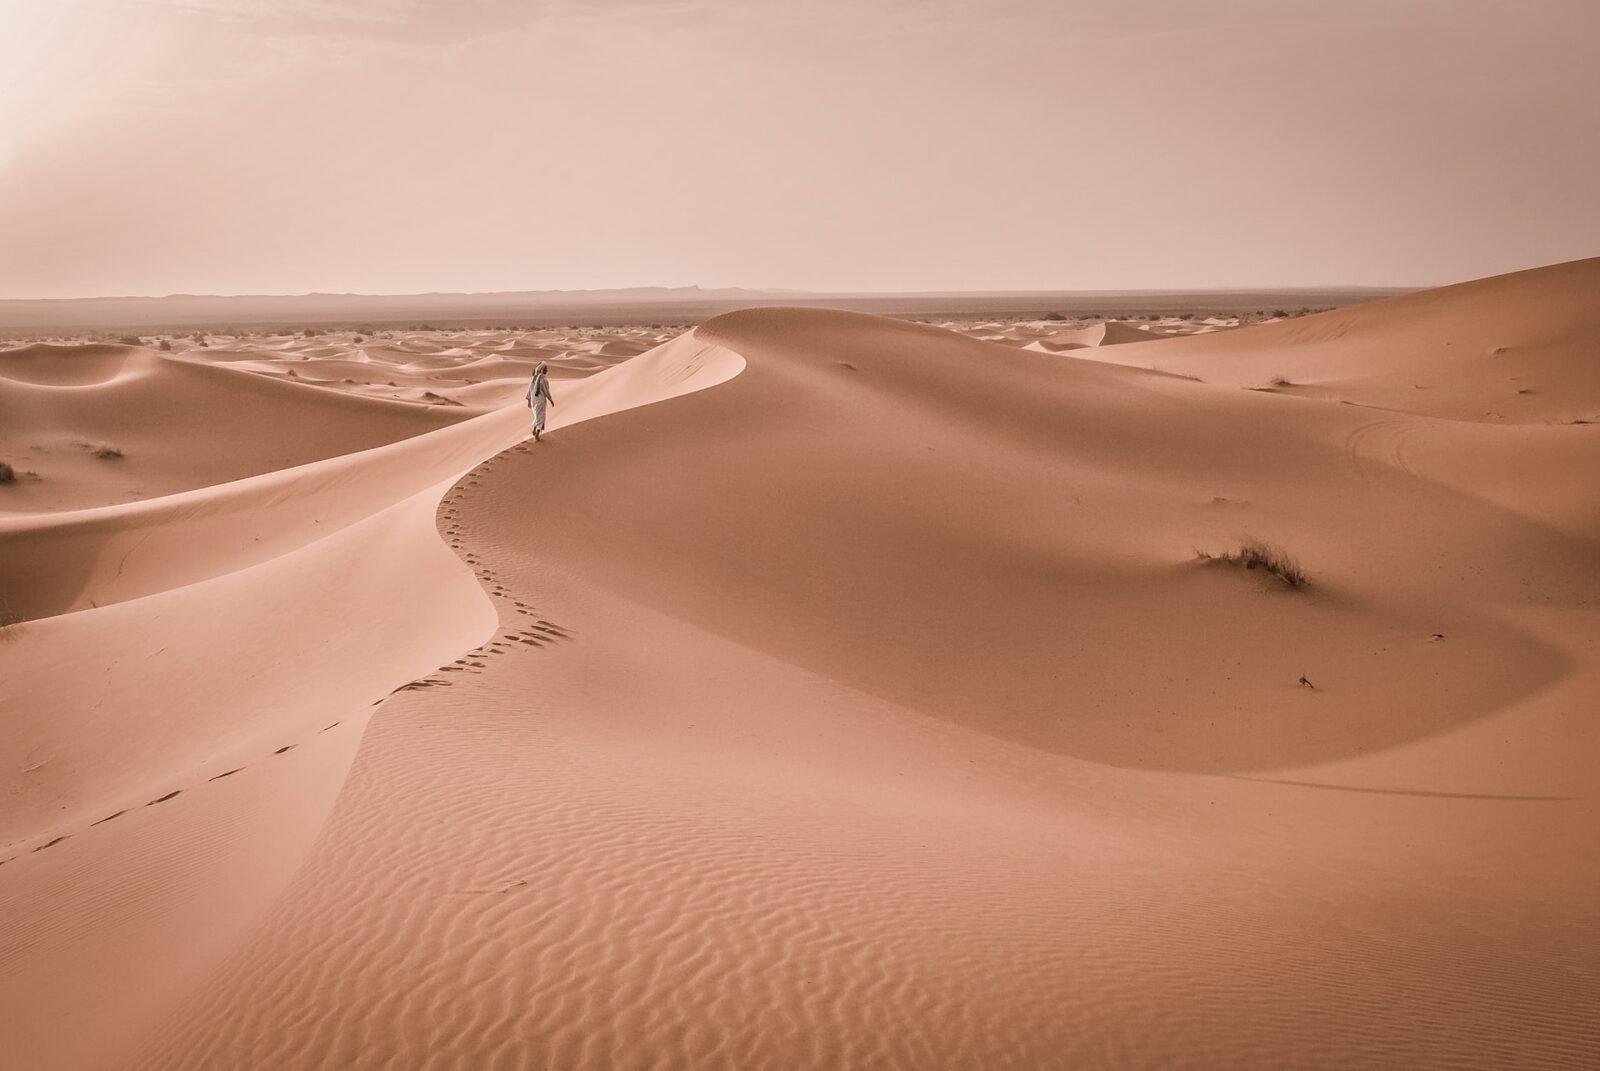 ruben bagues WIoeSvwJYRQ unsplash 1536x1028 - Guide Morocco Tours